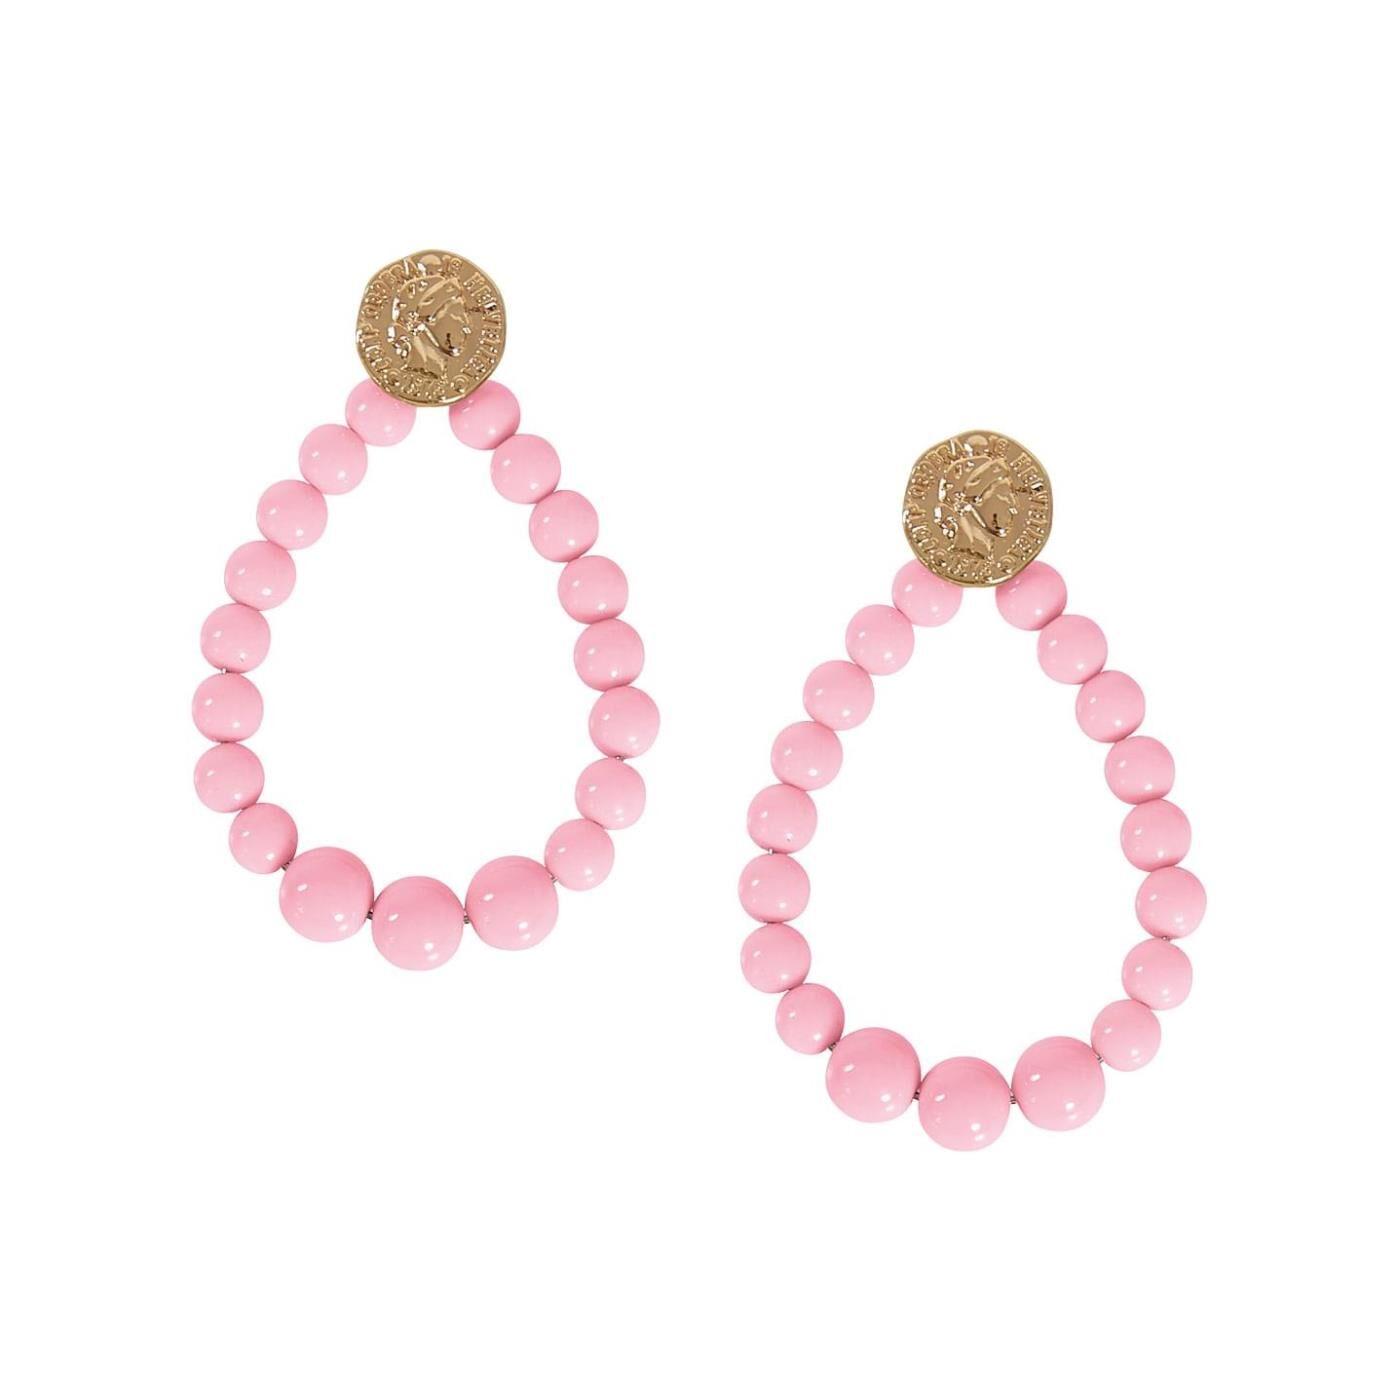 Celestino Κρεμαστά σκουλαρίκια με χάντρες  - Ροζ - Grootte: One Size